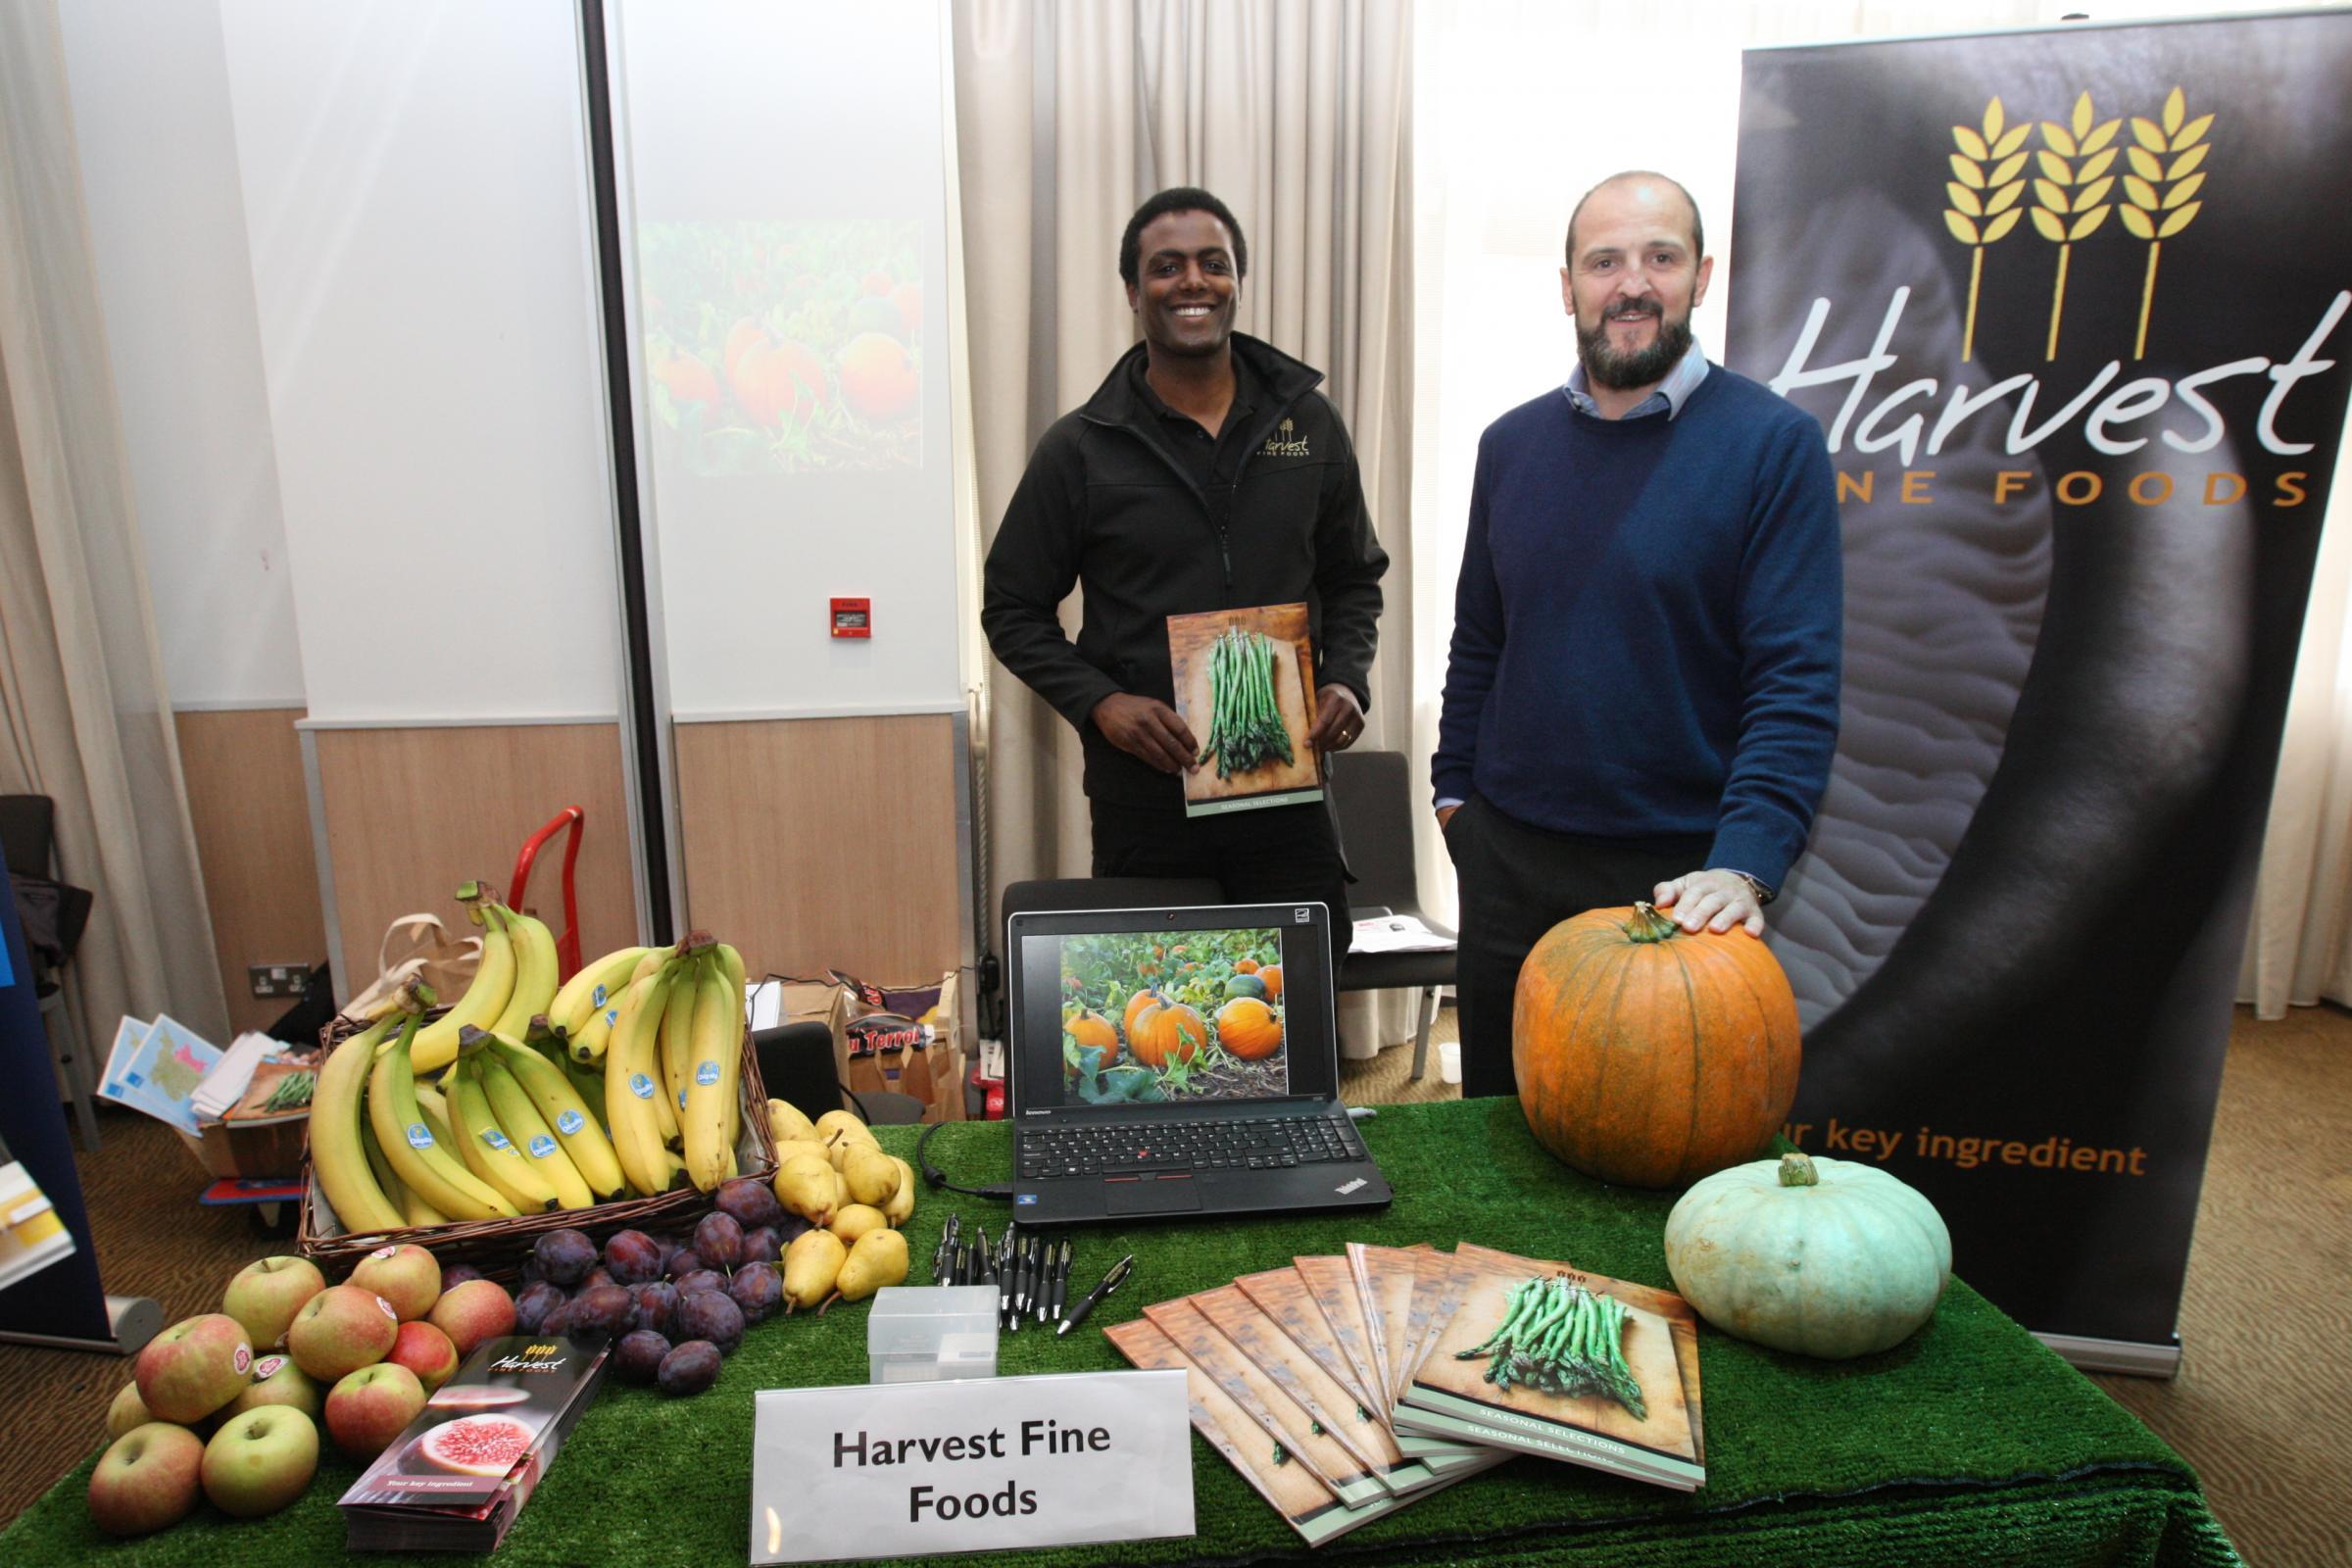 Darren Henry and Dr Richard Strongman from Harvest Fine Foods